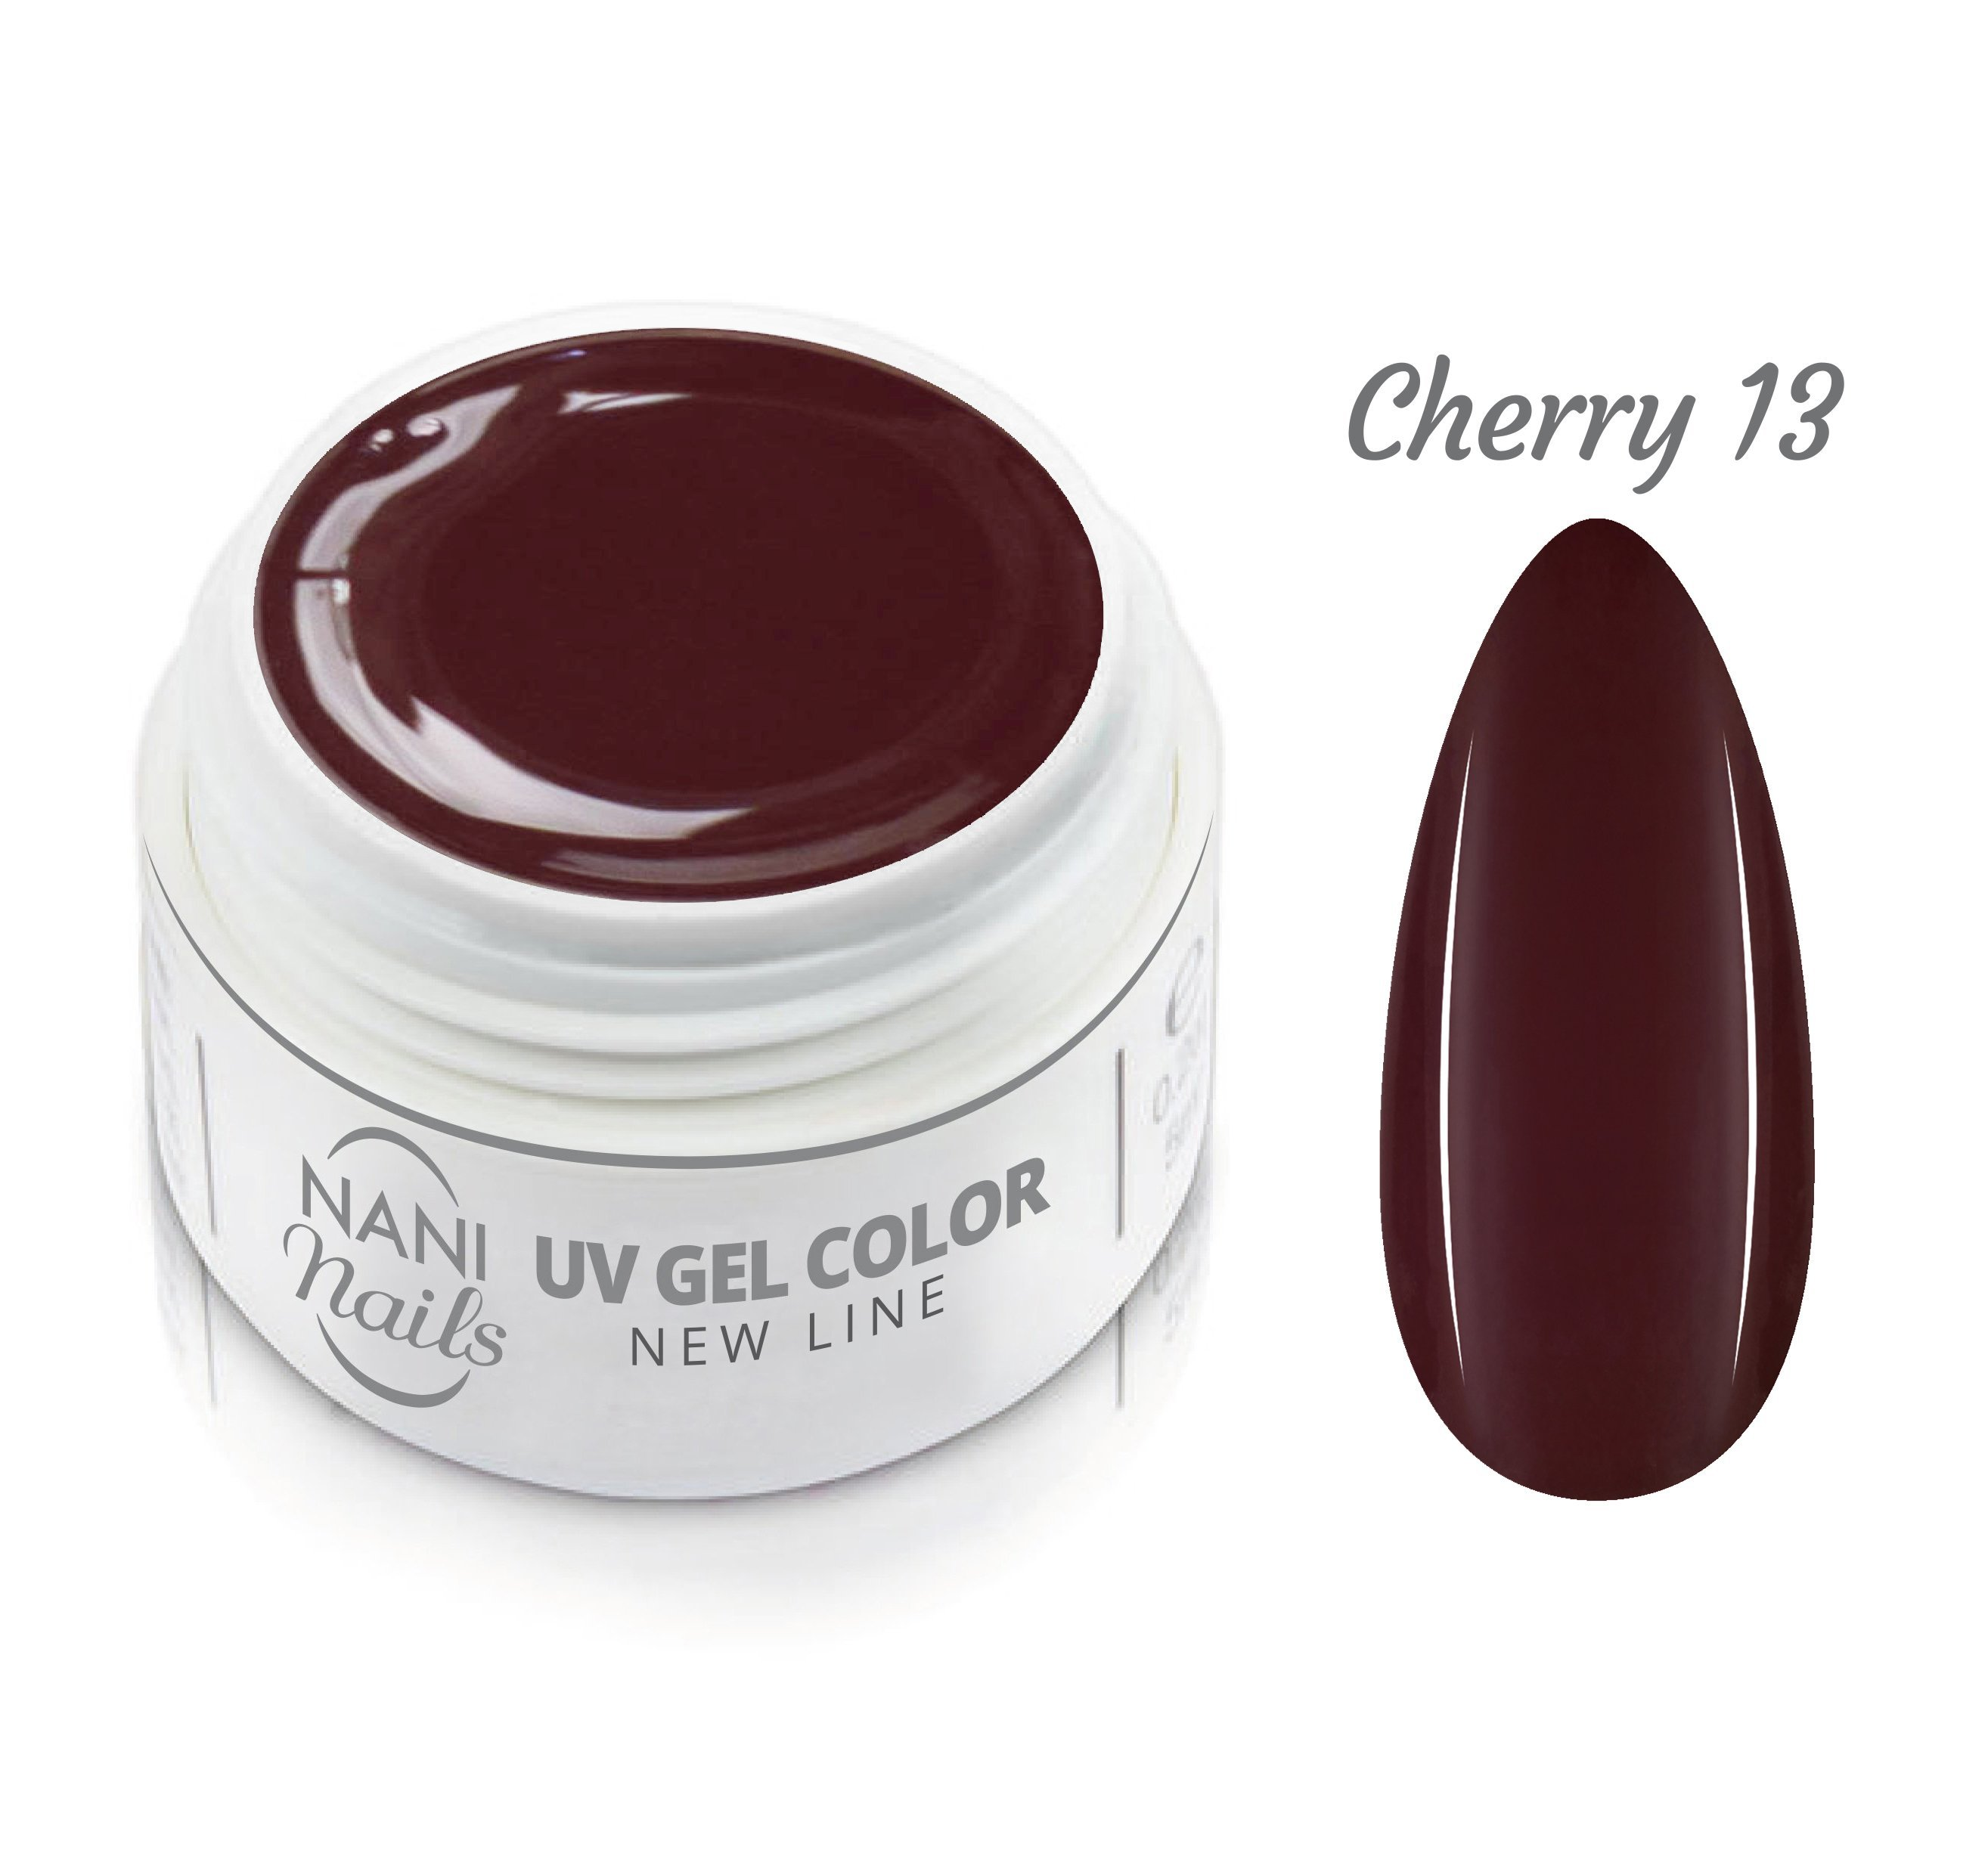 NANI UV gél New Line 5 ml - Cherry